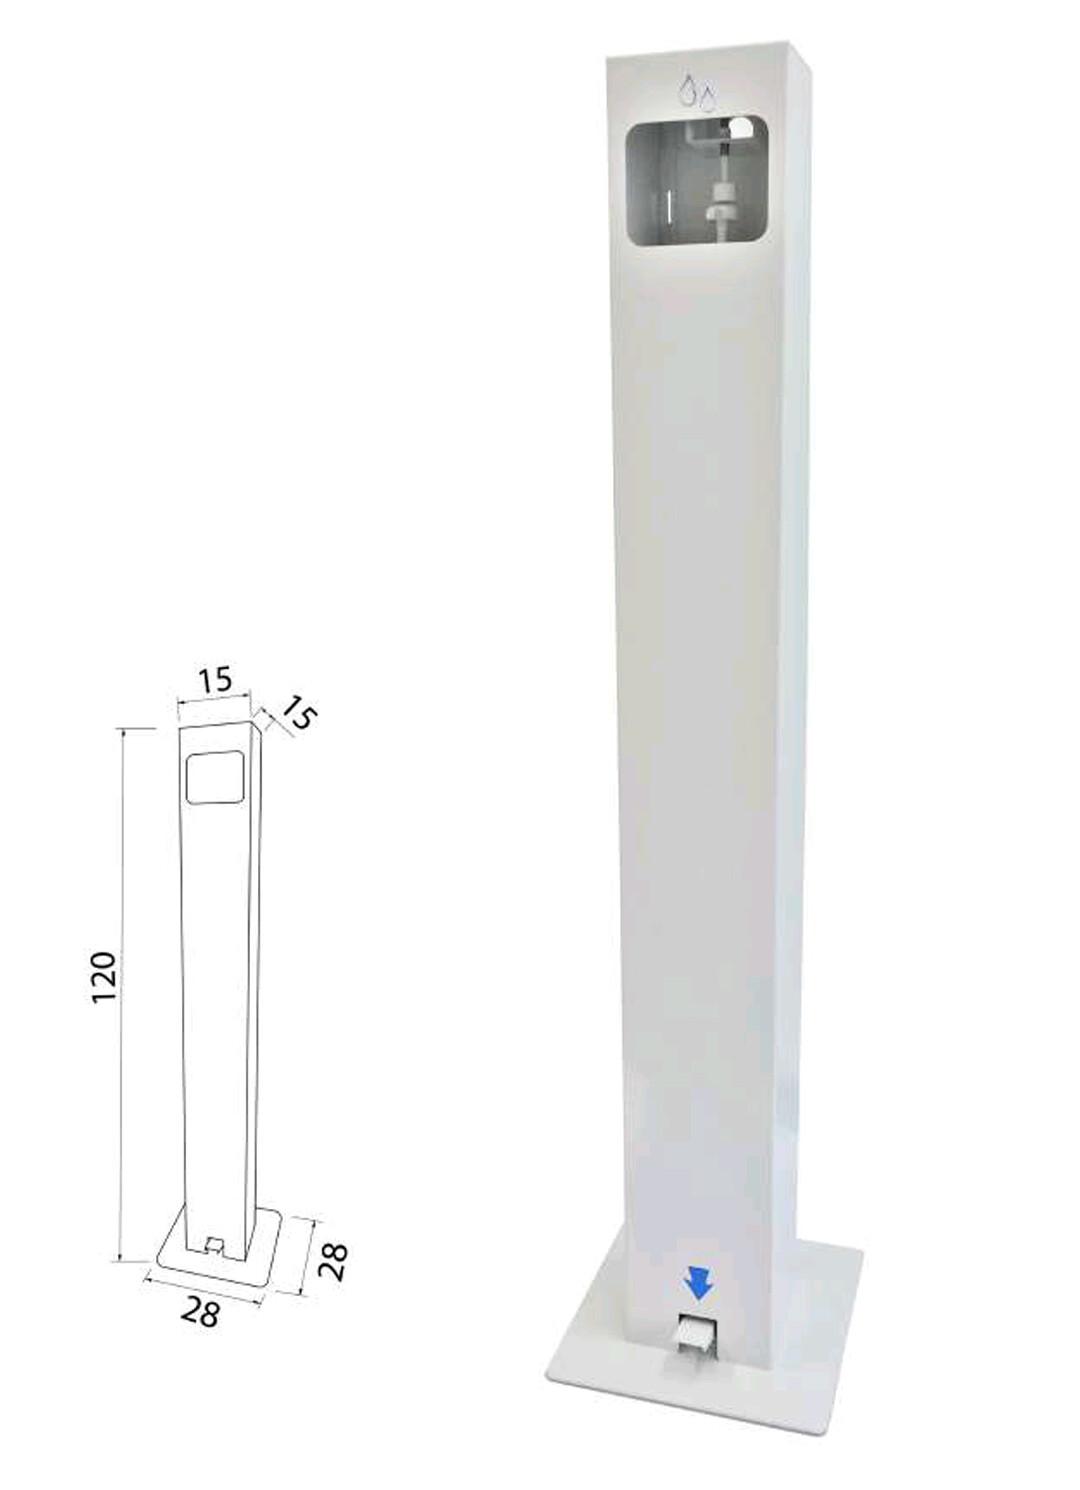 Dispensador de gel a pedal autoportante. Medidas: 120 x 28 x 28 cm. Columna 15 x 15 cm.